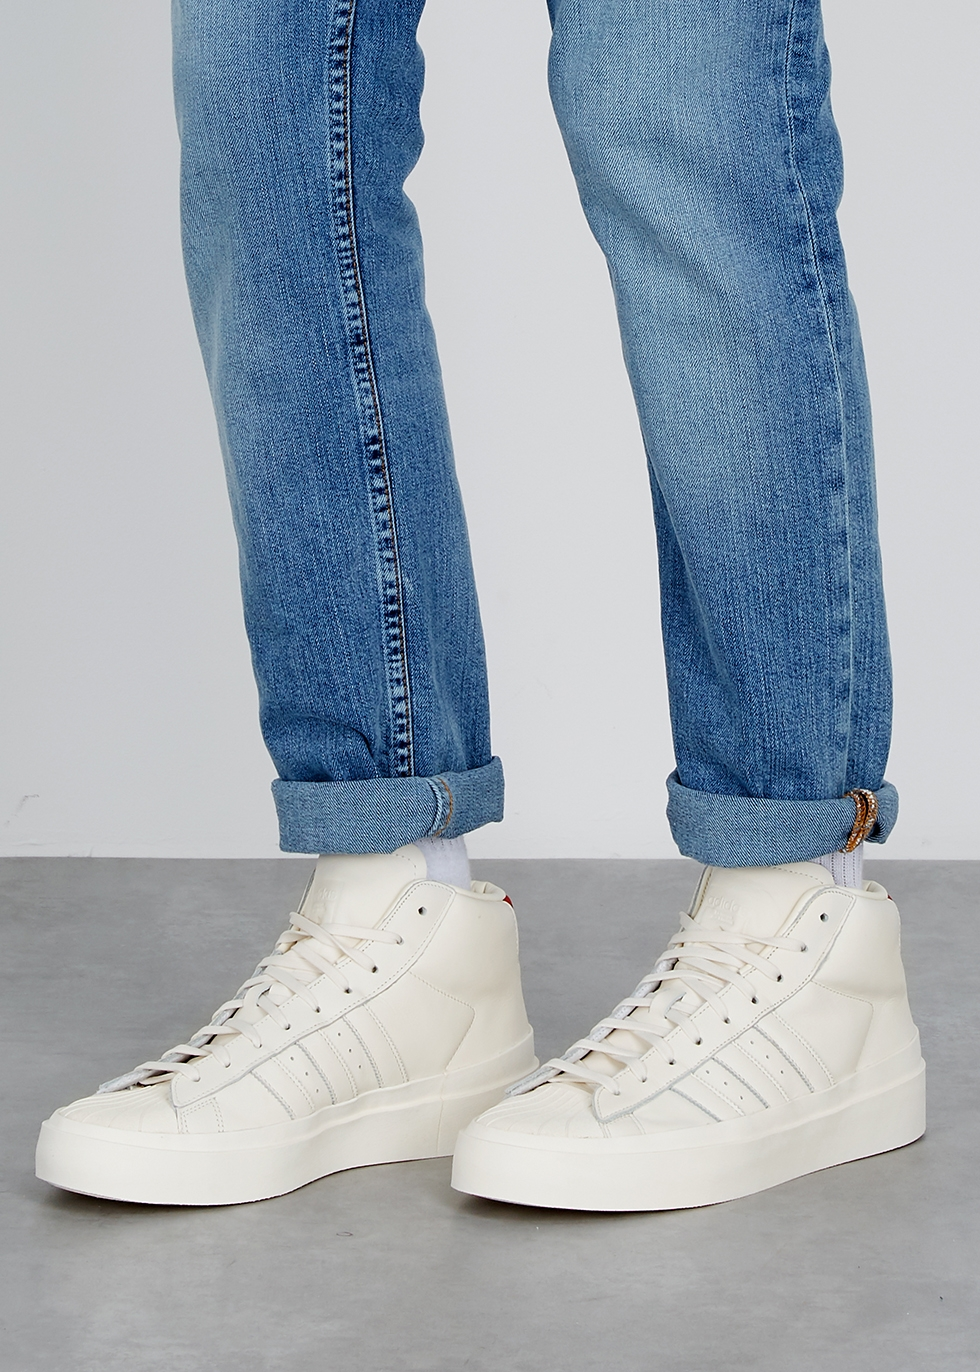 adidas schoenen trekpleister